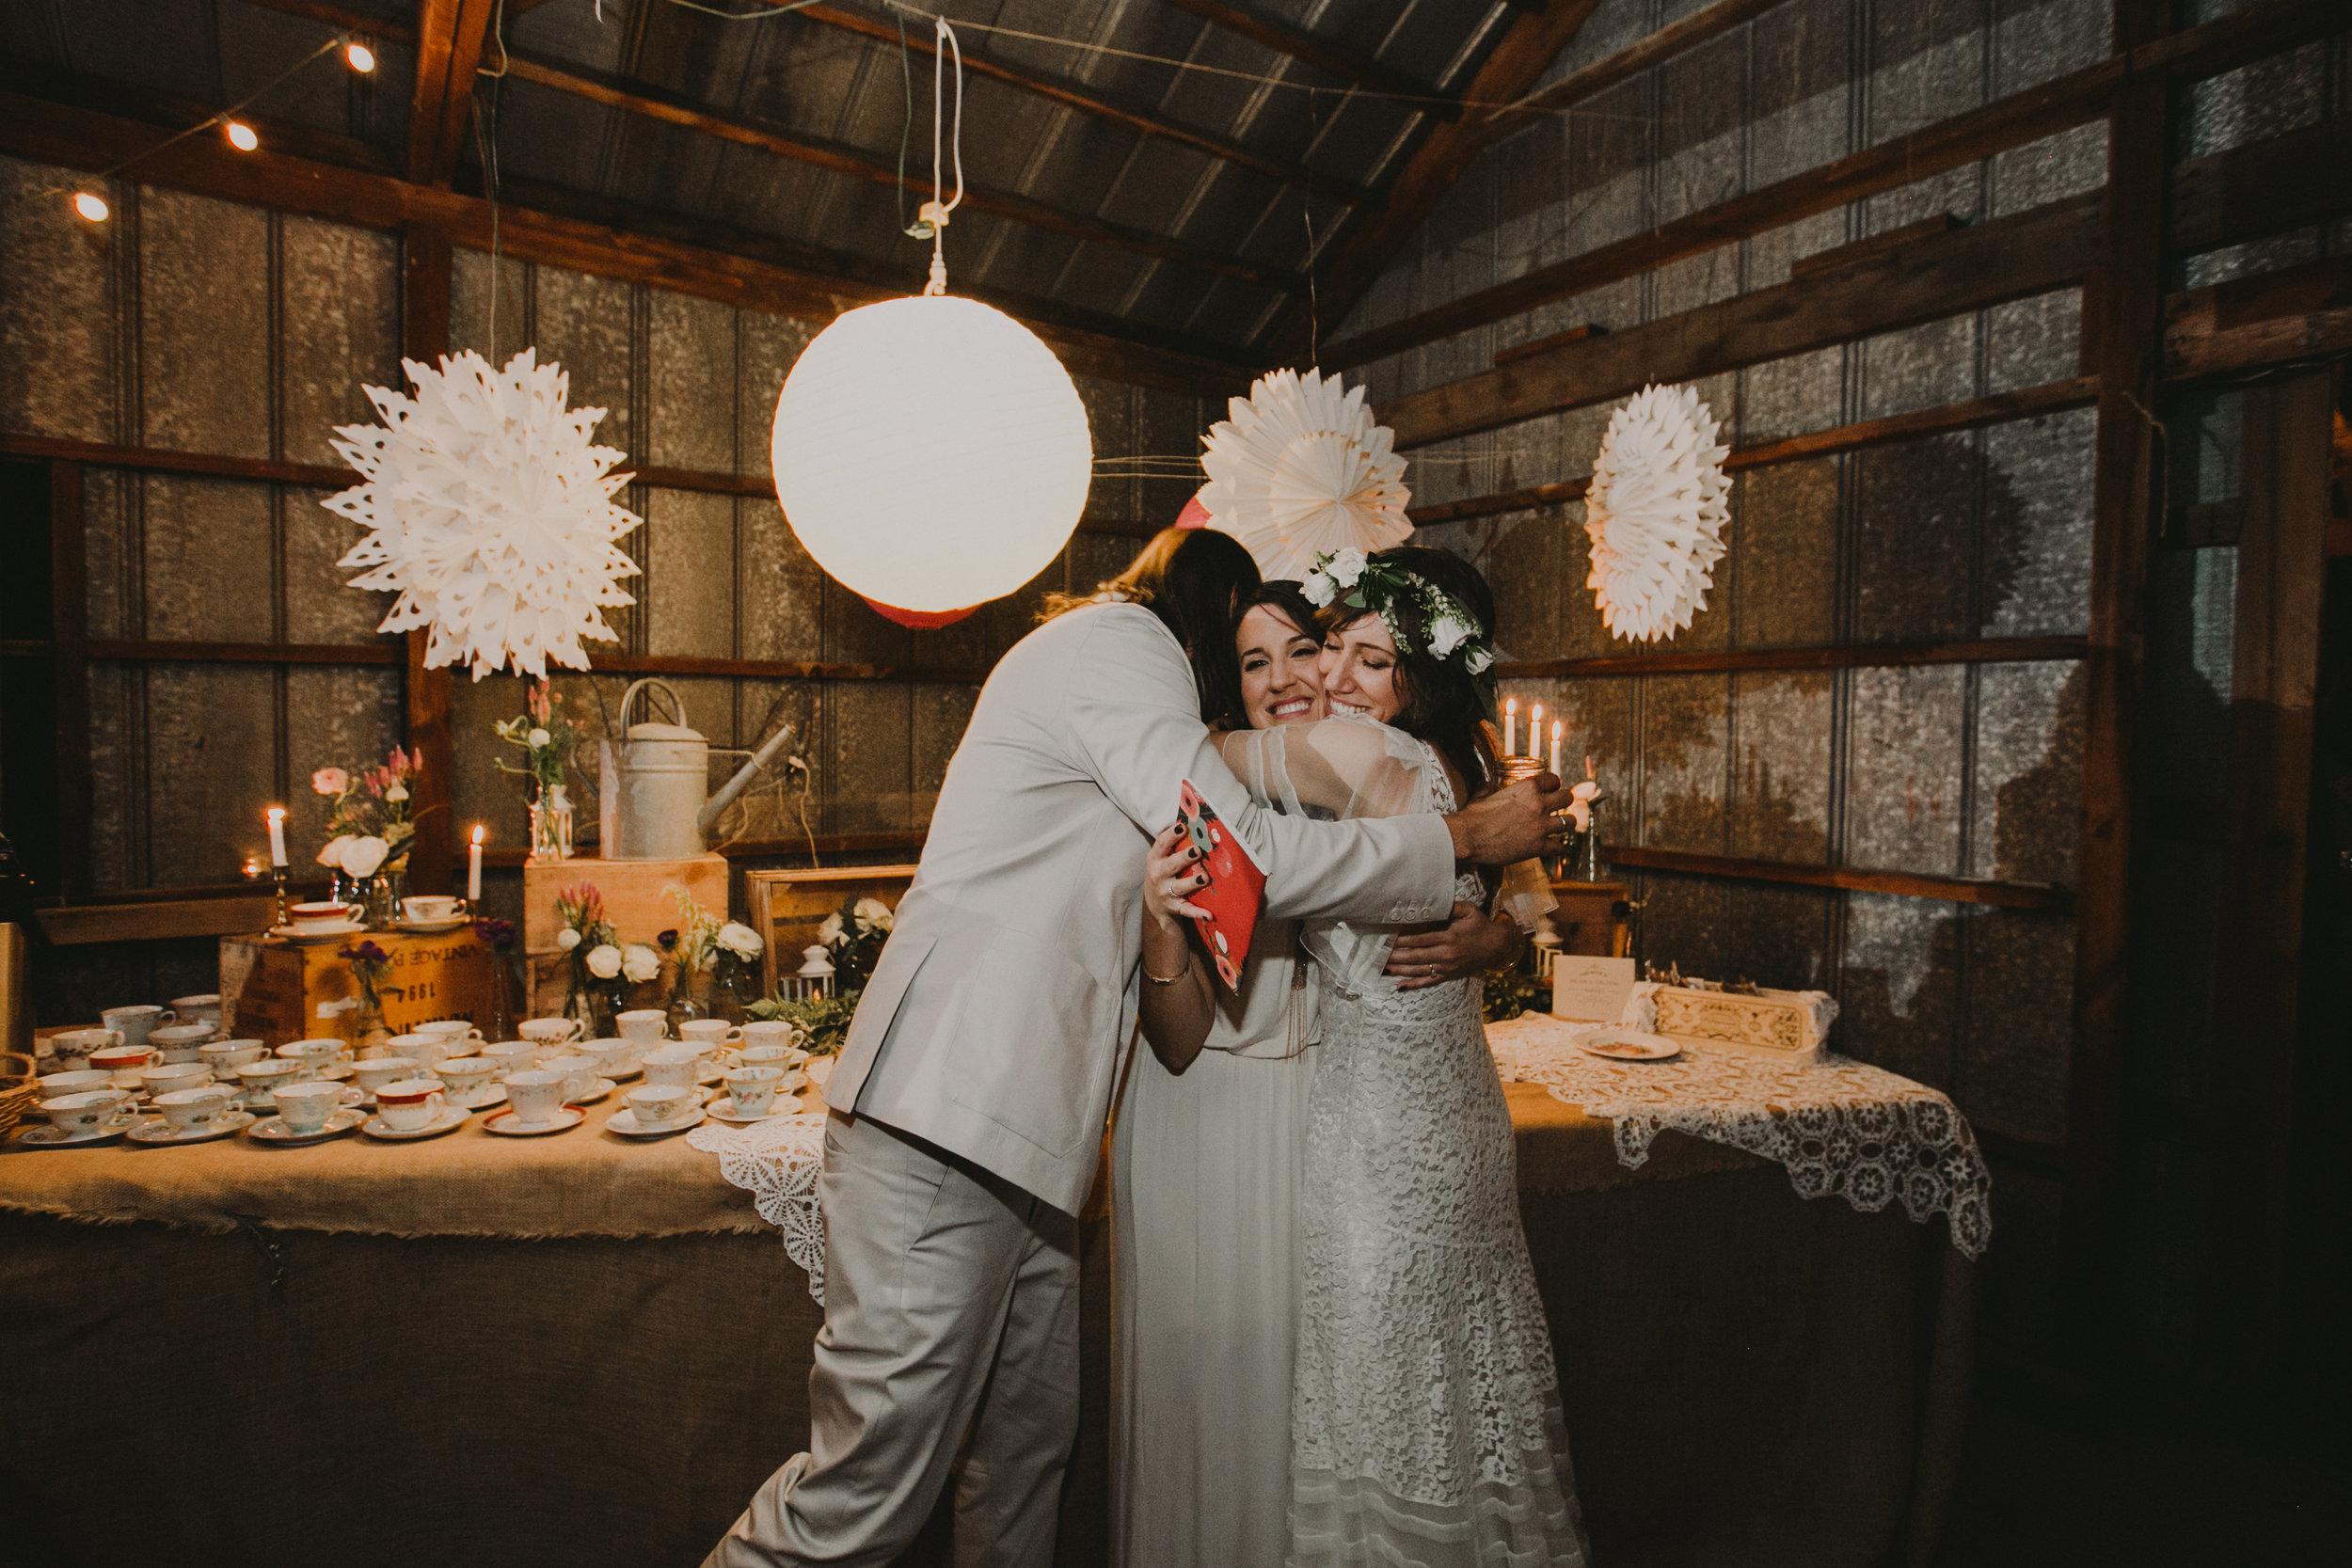 LIBERTY_VIEW_FARM_HIGHLAND_NY_WEDDING_CHELLISE_MICHAEL_PHOTOGRAPHY883.JPG